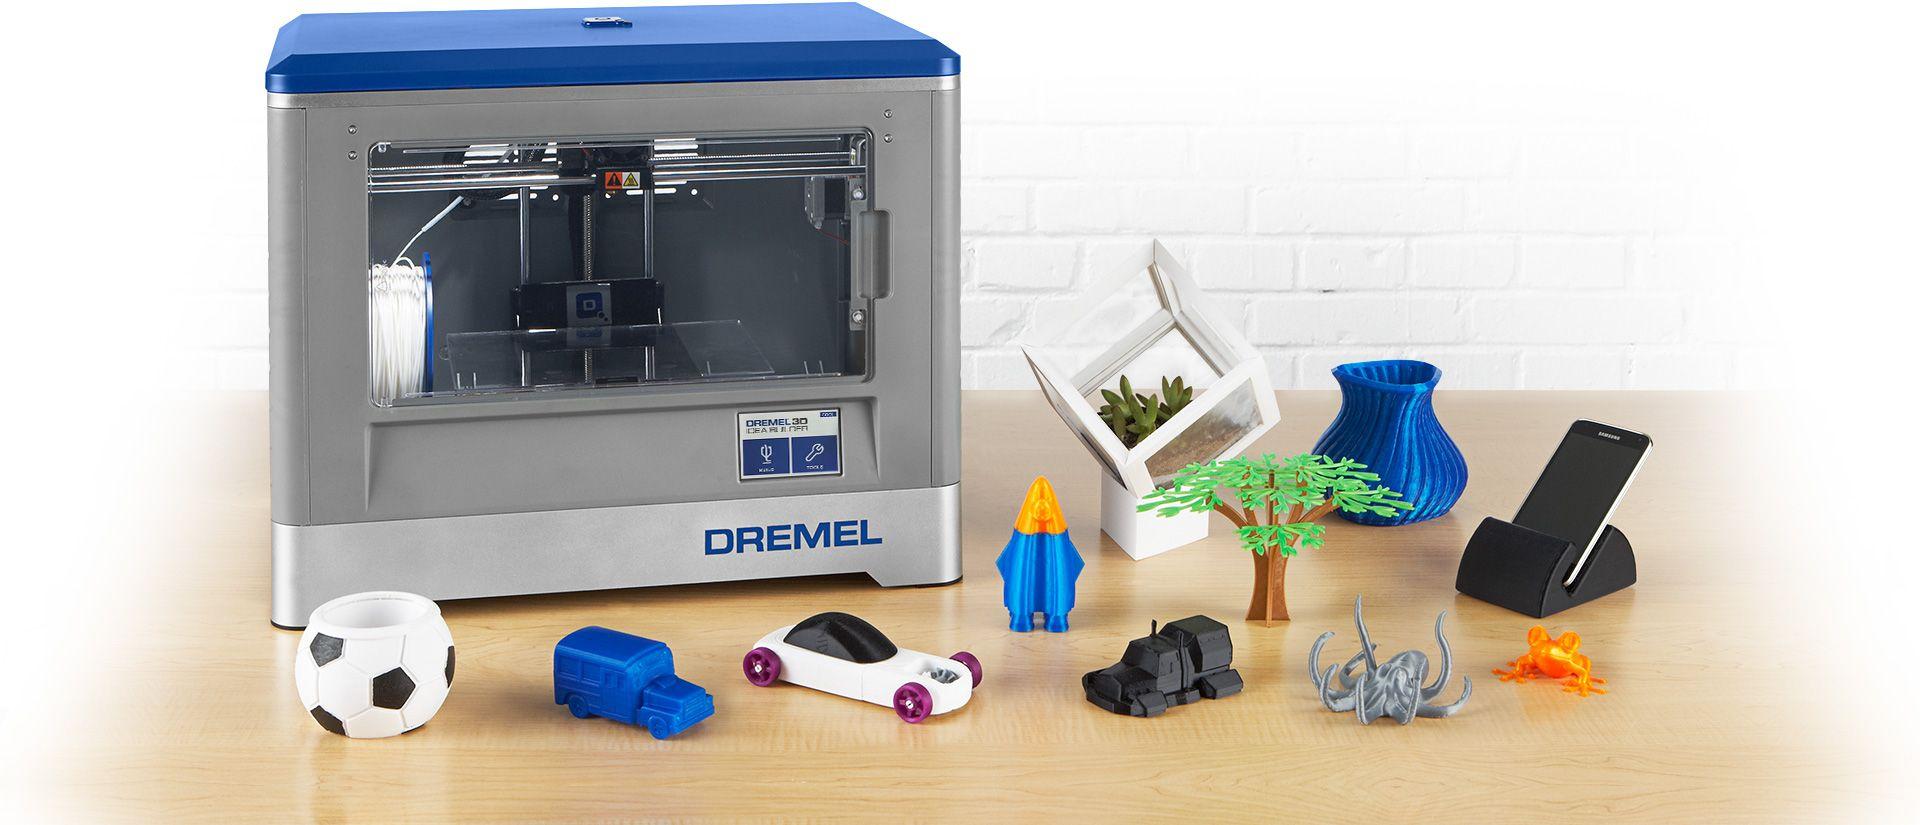 Dremel IdeaBuilder 3D printer Dremel 3d printer, Dremel